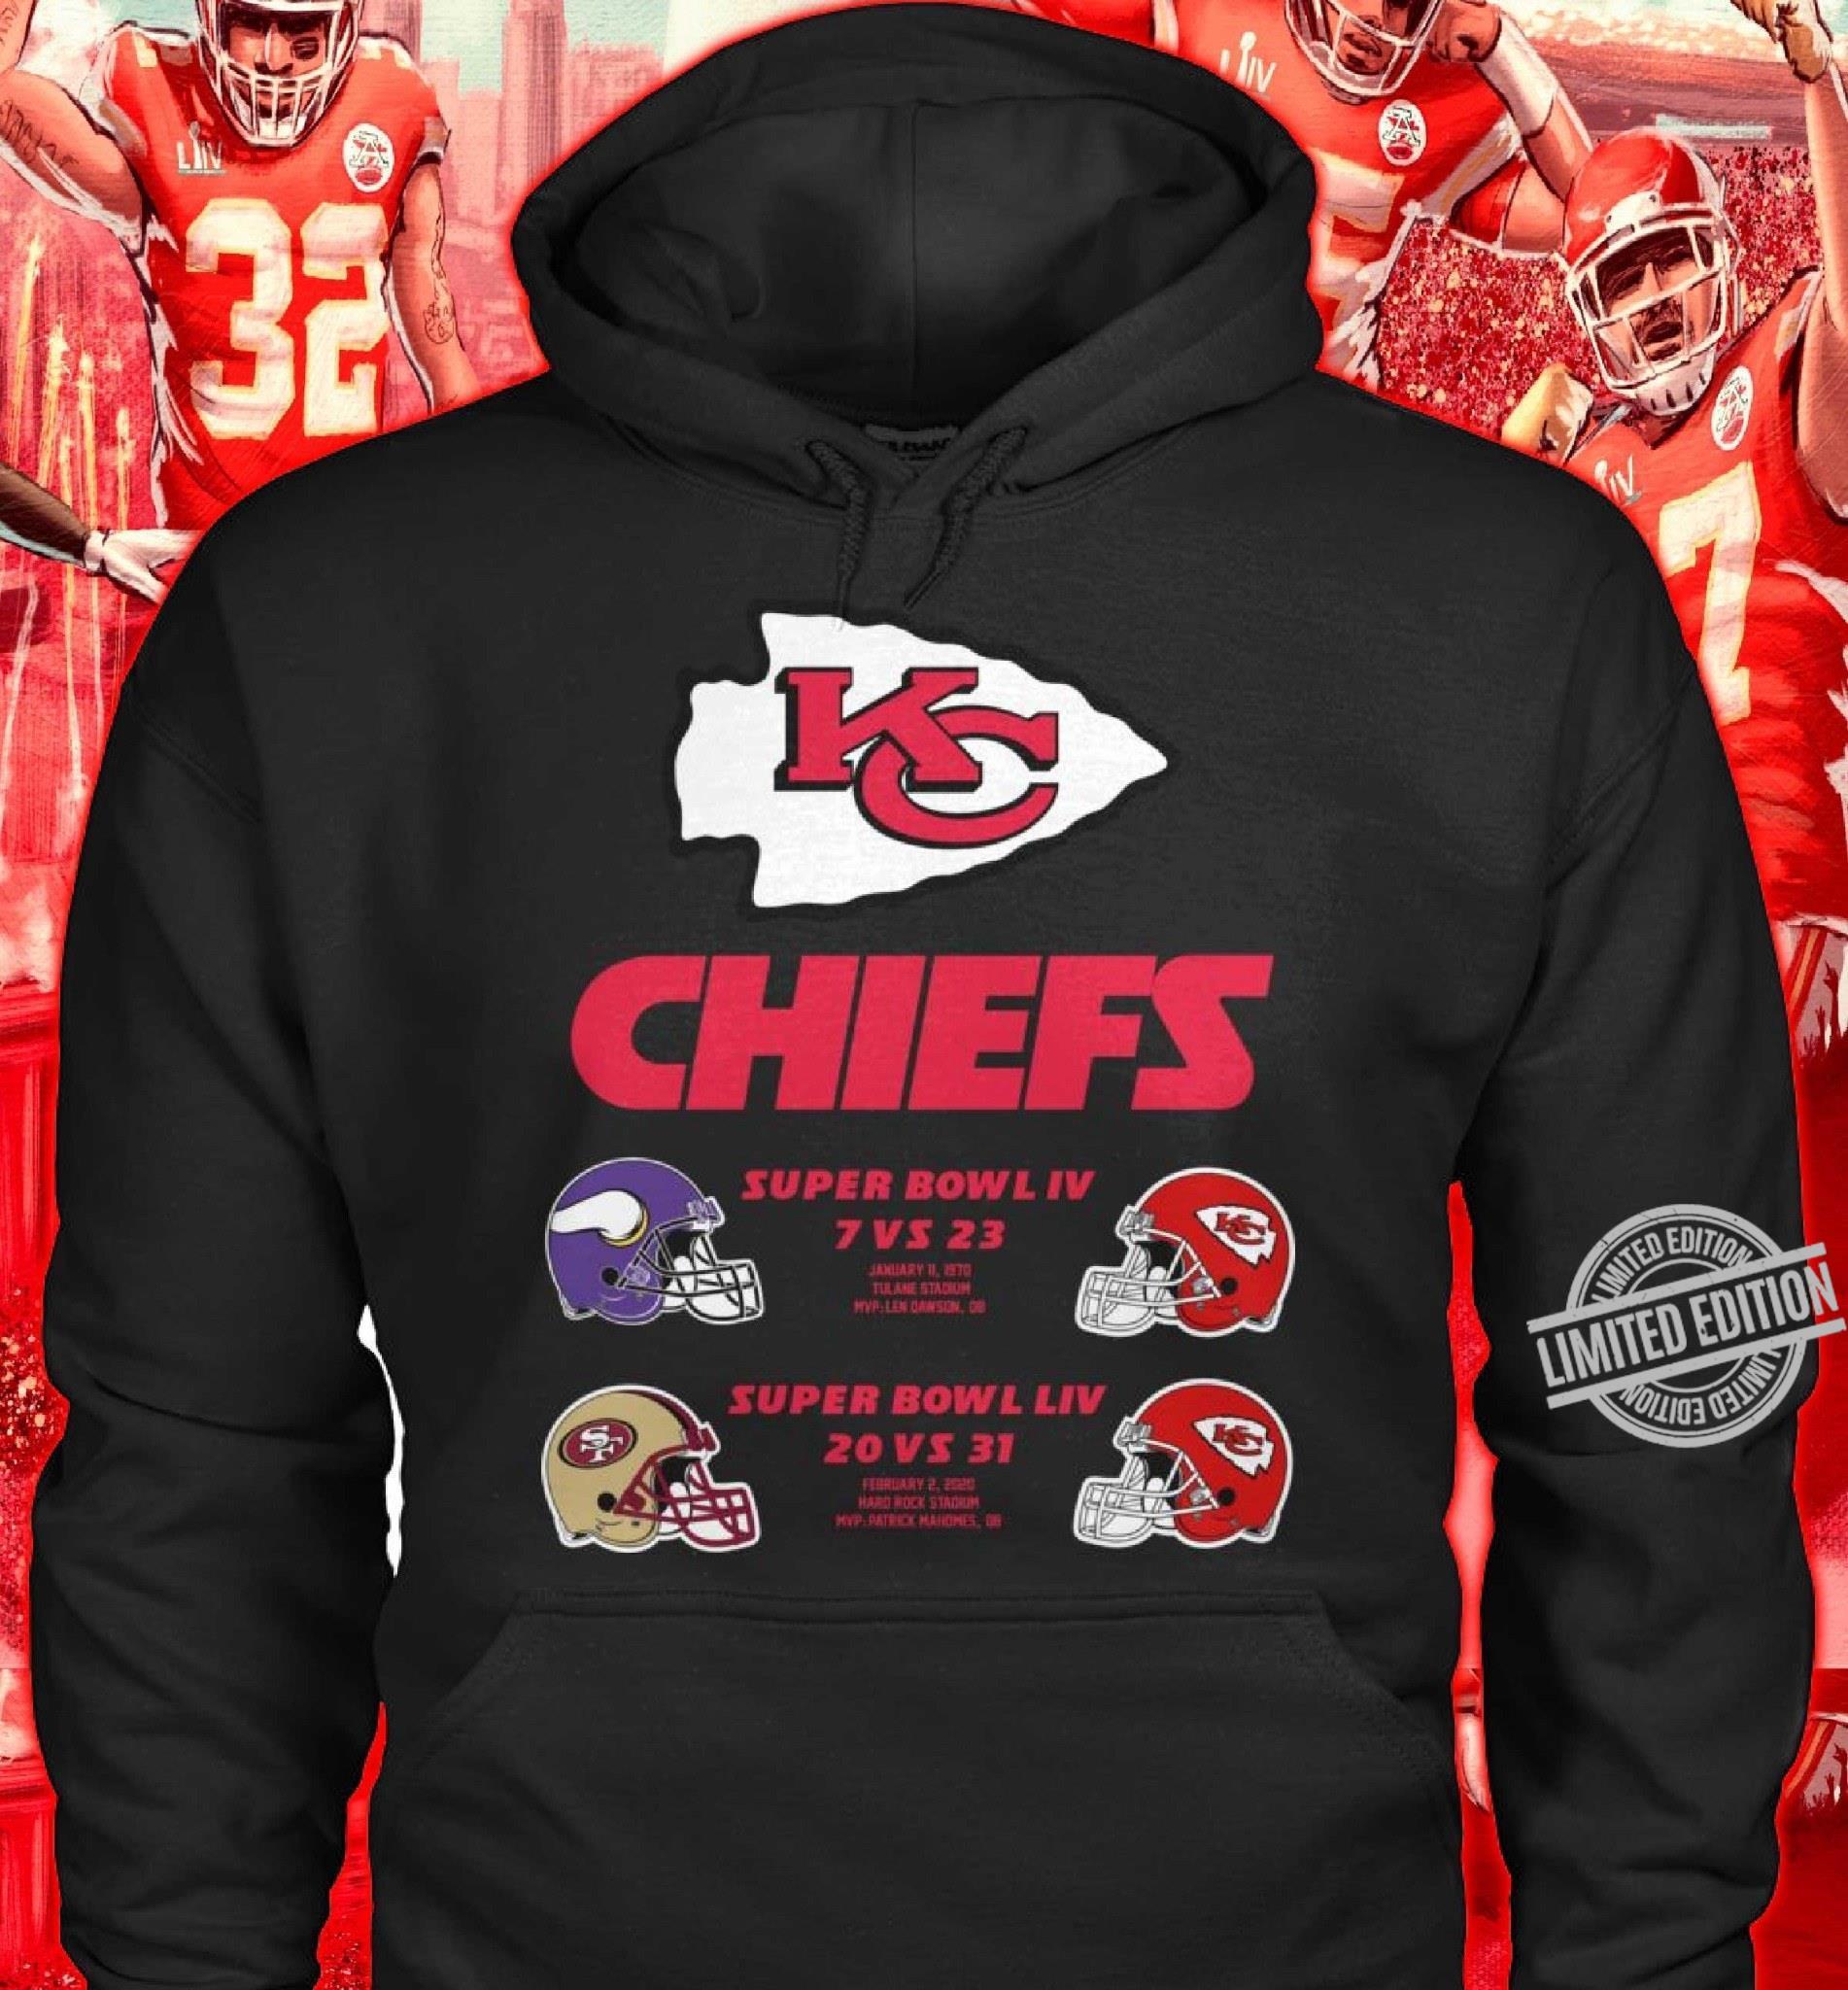 Chiefs Super Bowl IV Shirt